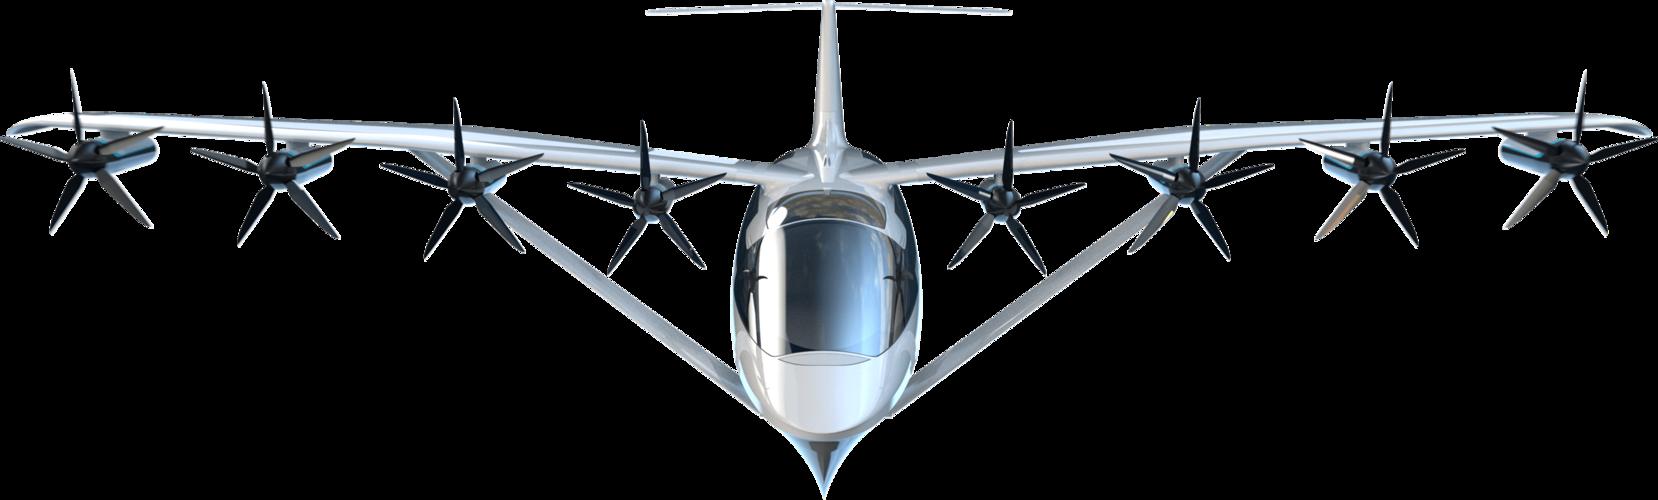 602dafdac73f8d4e45e71674_hero-plane.png